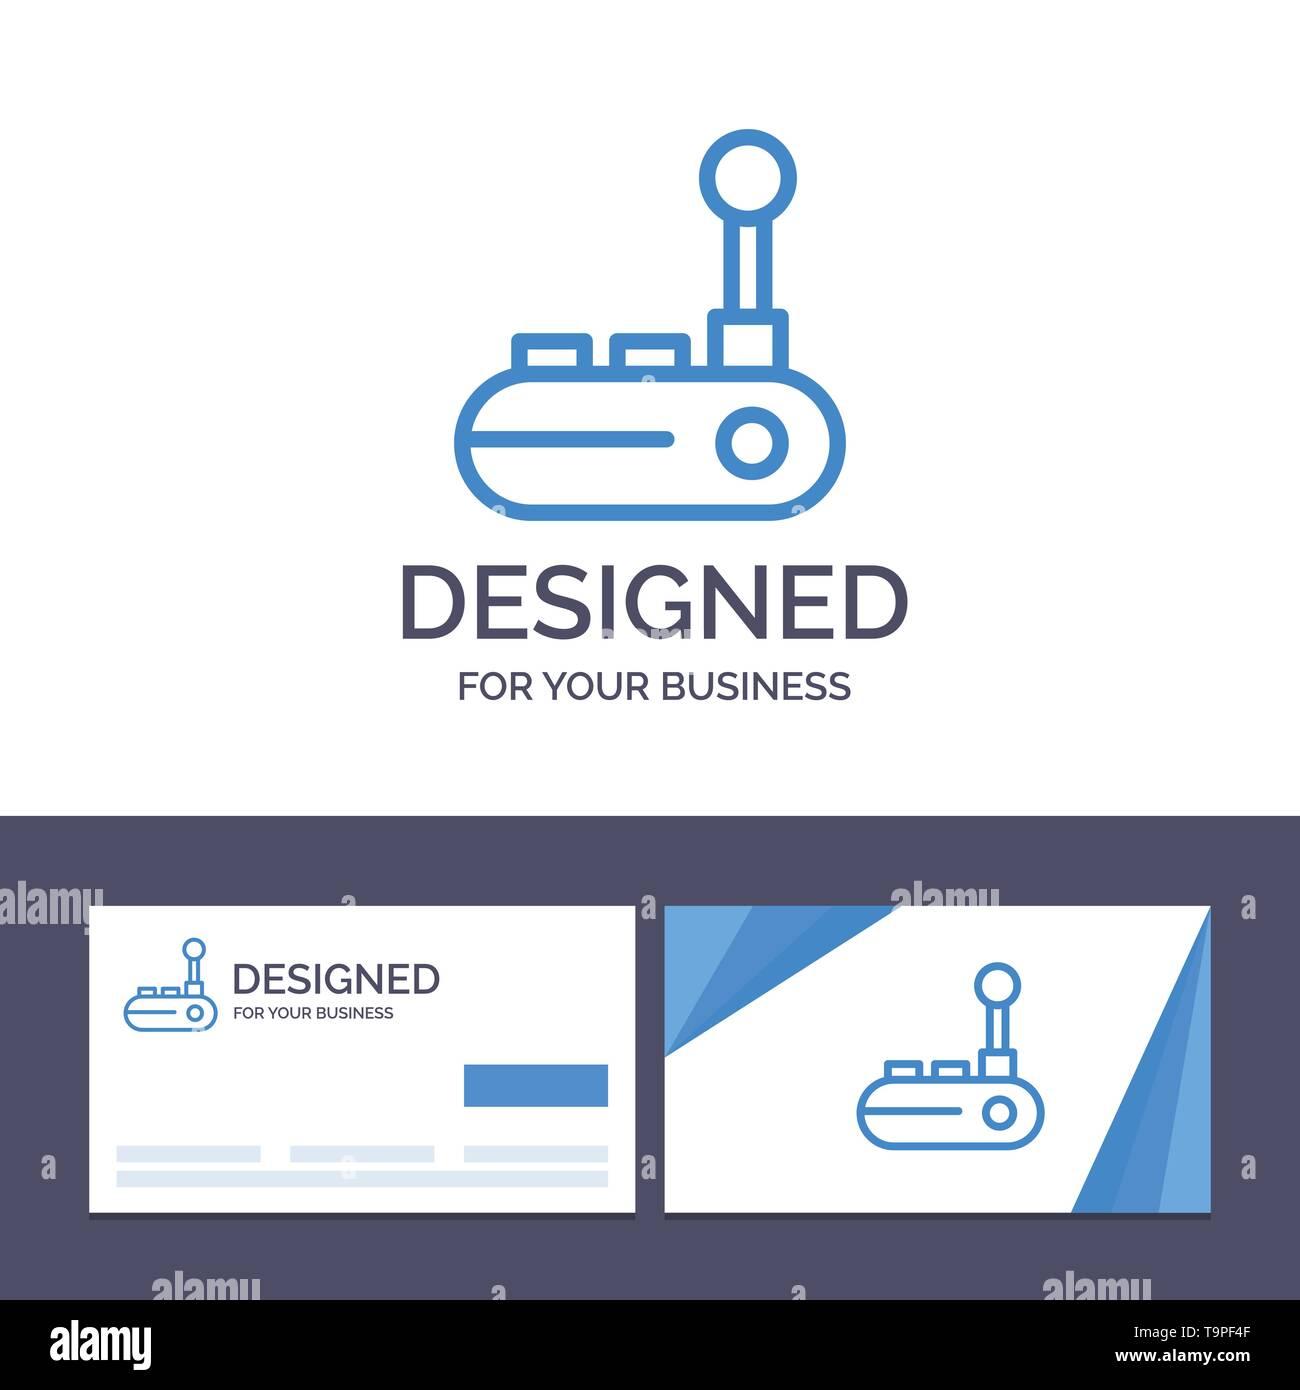 Creative Business Card and Logo template Controller, Joy Pad, Joy Stick, Joy pad Vector Illustration - Stock Image